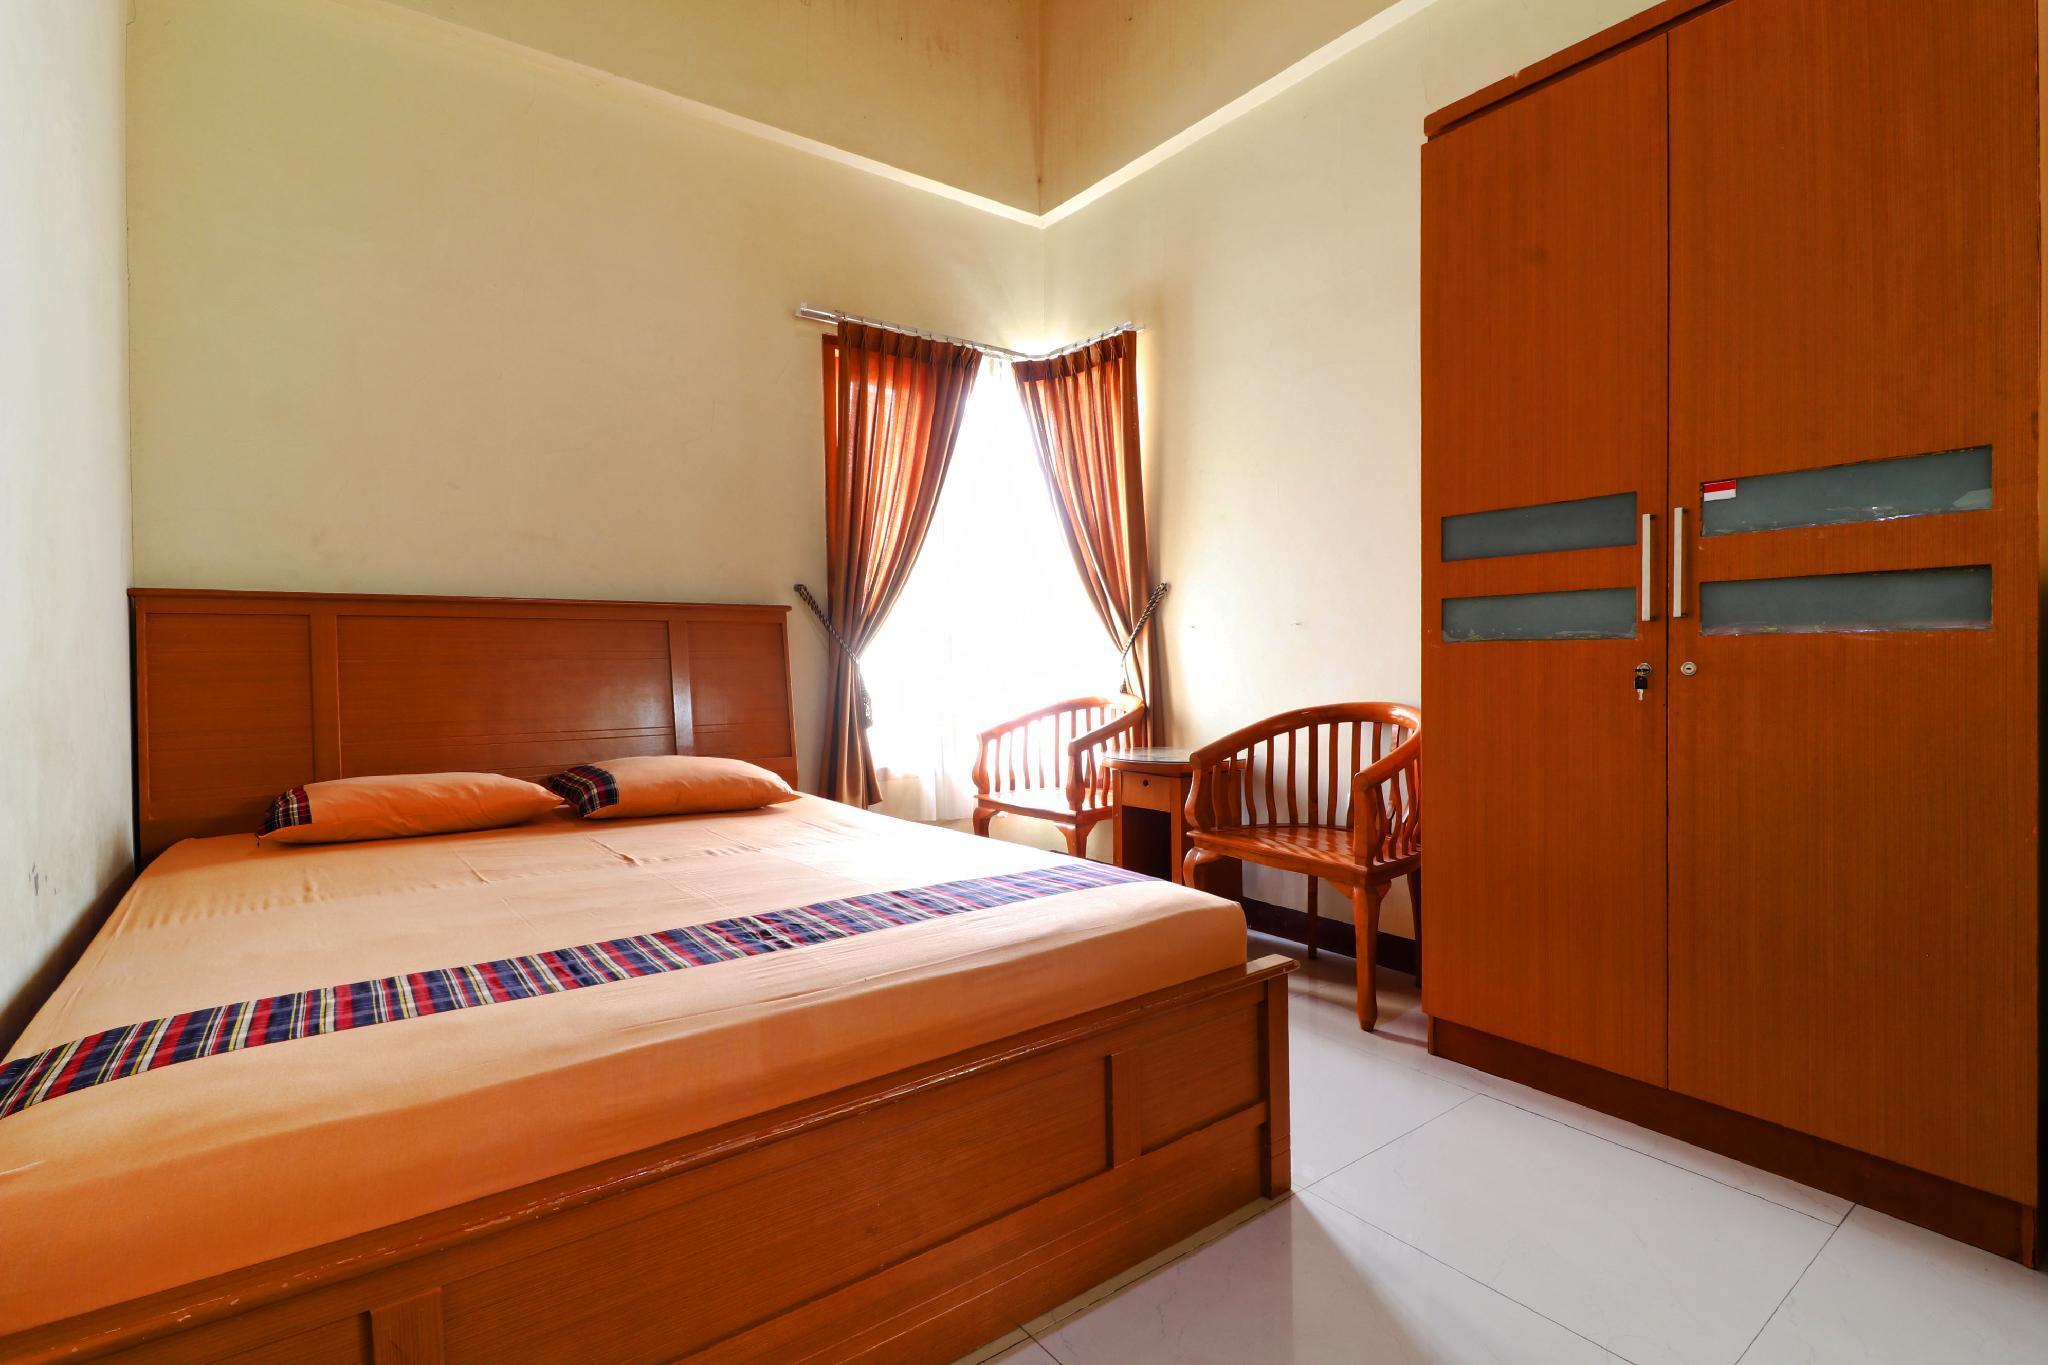 Bedur Guest House